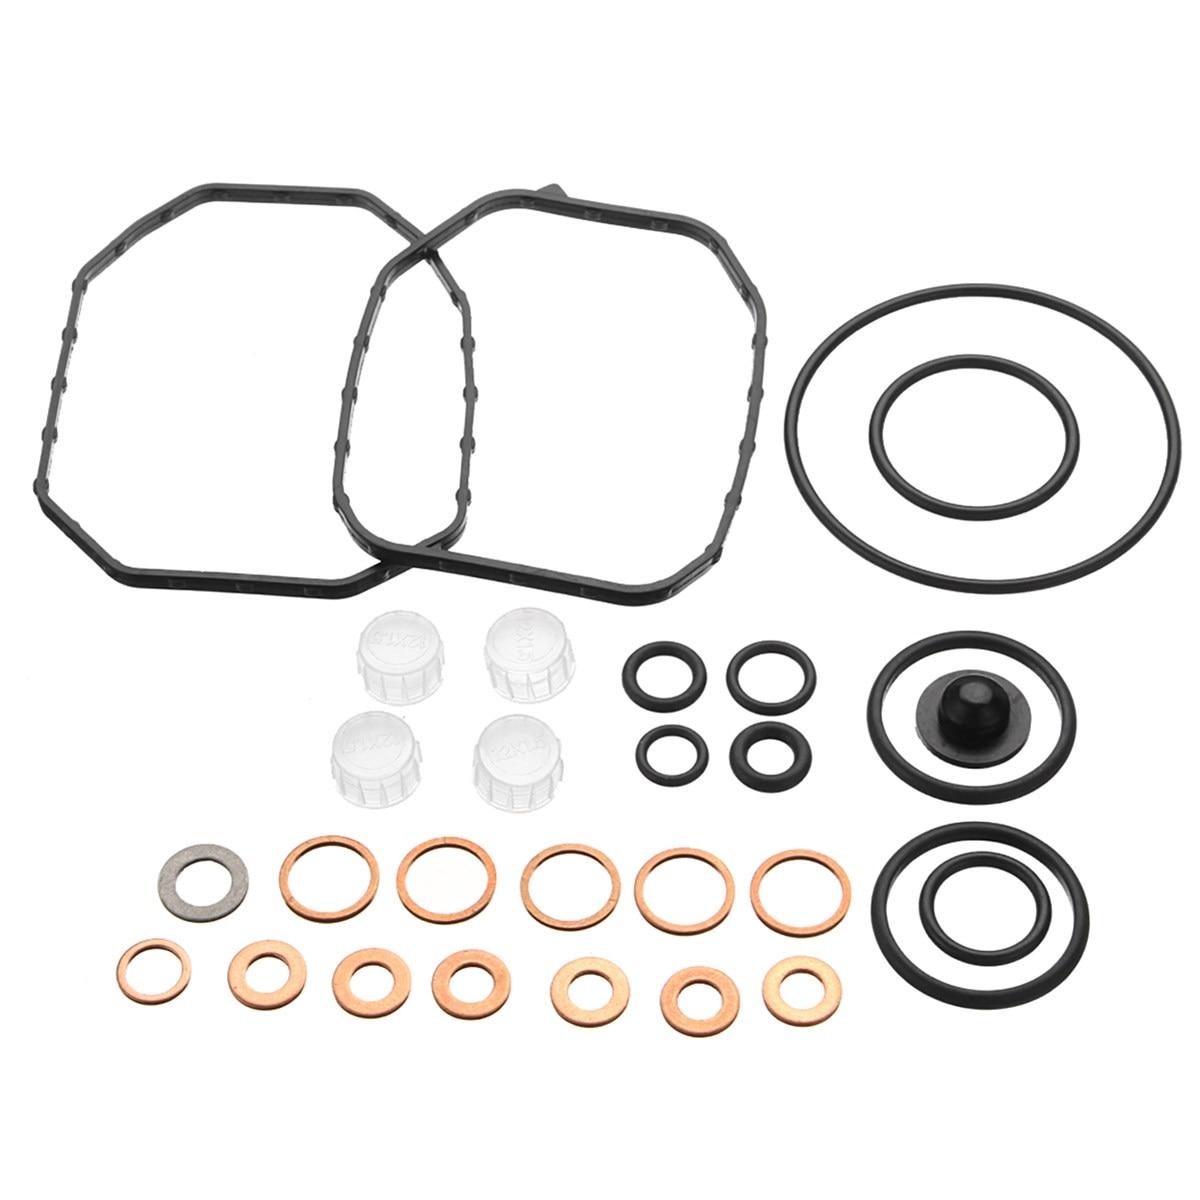 Injection Pump Repair Seal Kit For VW Beetle Golf Jetta for Audi 1.9 TDI 2467010003